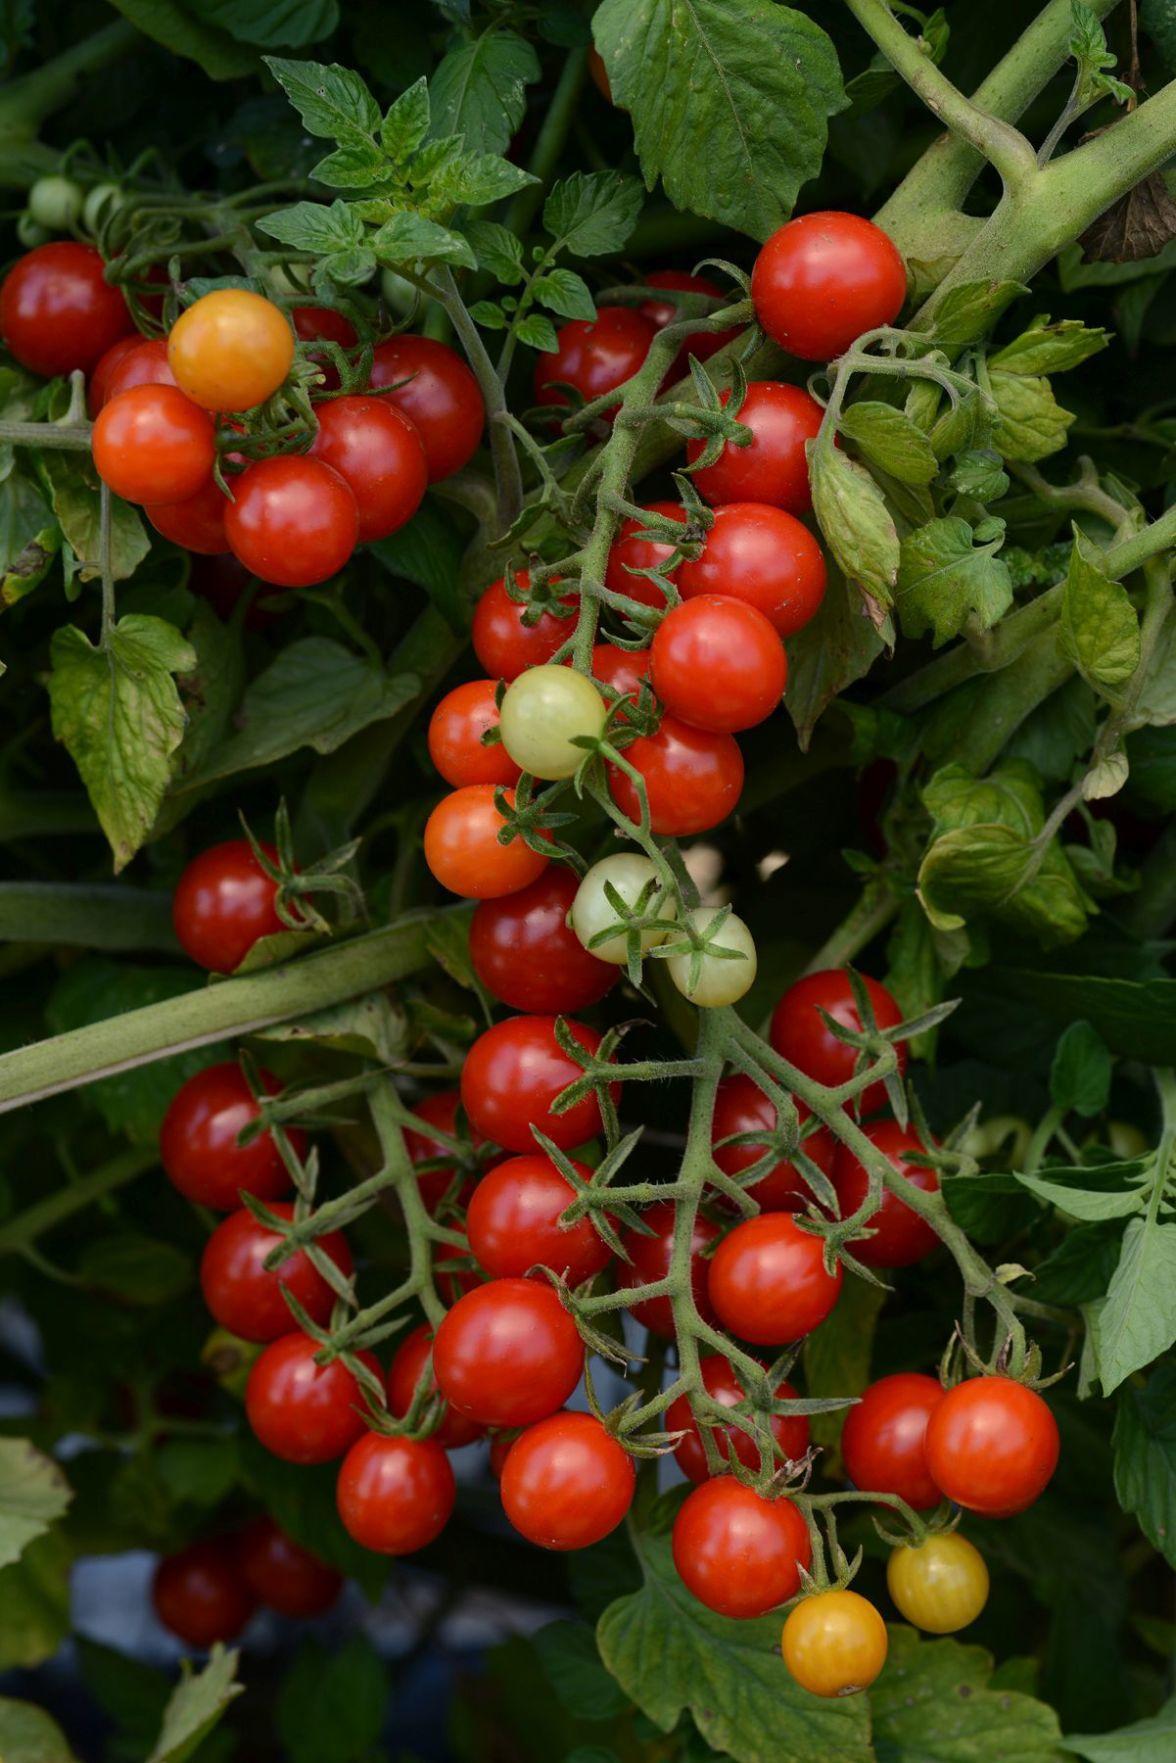 Tomato_CurrantCandylandRed-AAS2016.PRIMARY-1.jpg